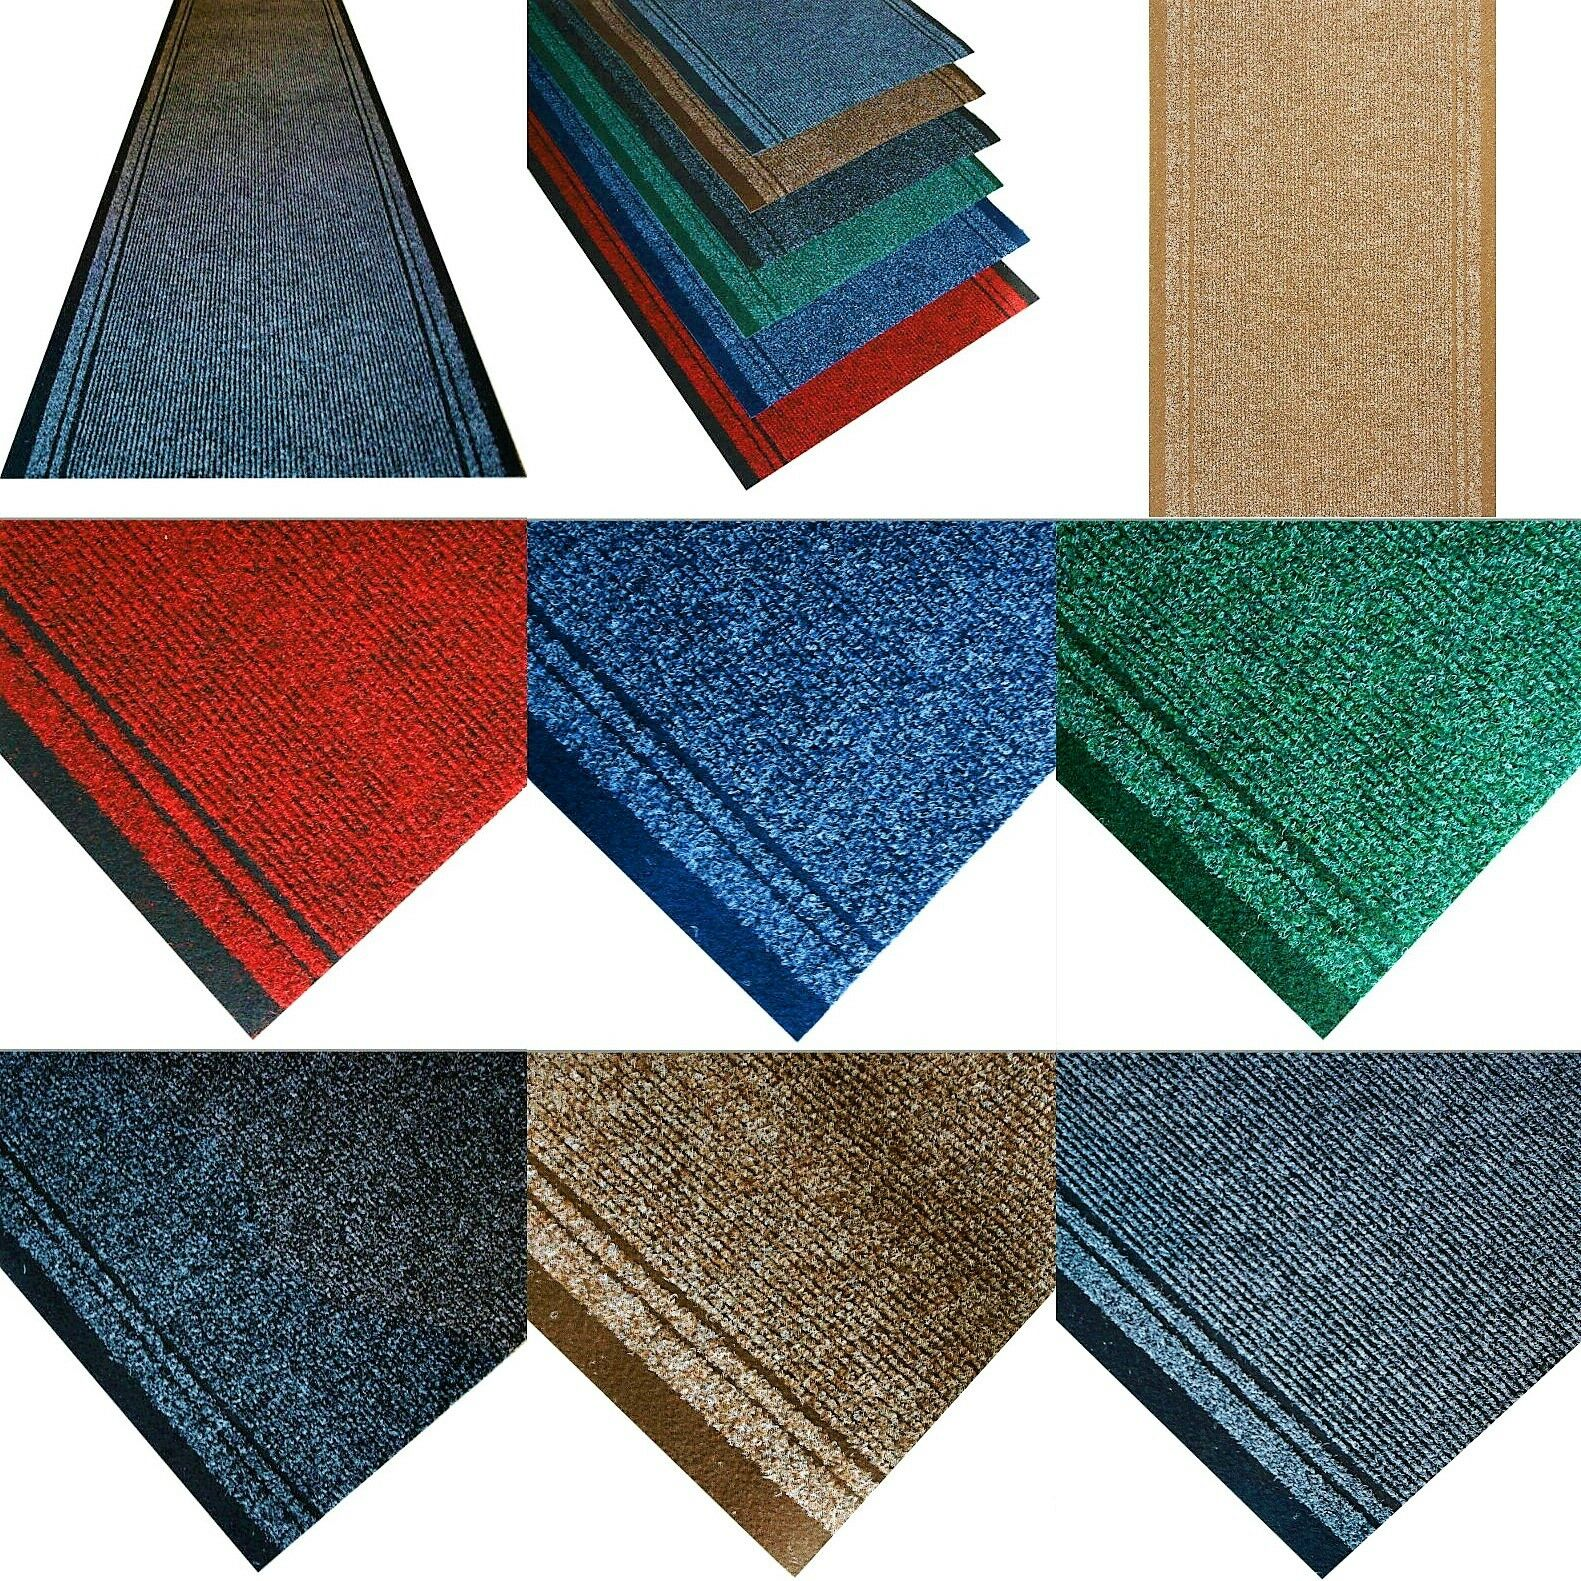 markiert rutschfest teppich fu matte teppichl ufer flur. Black Bedroom Furniture Sets. Home Design Ideas